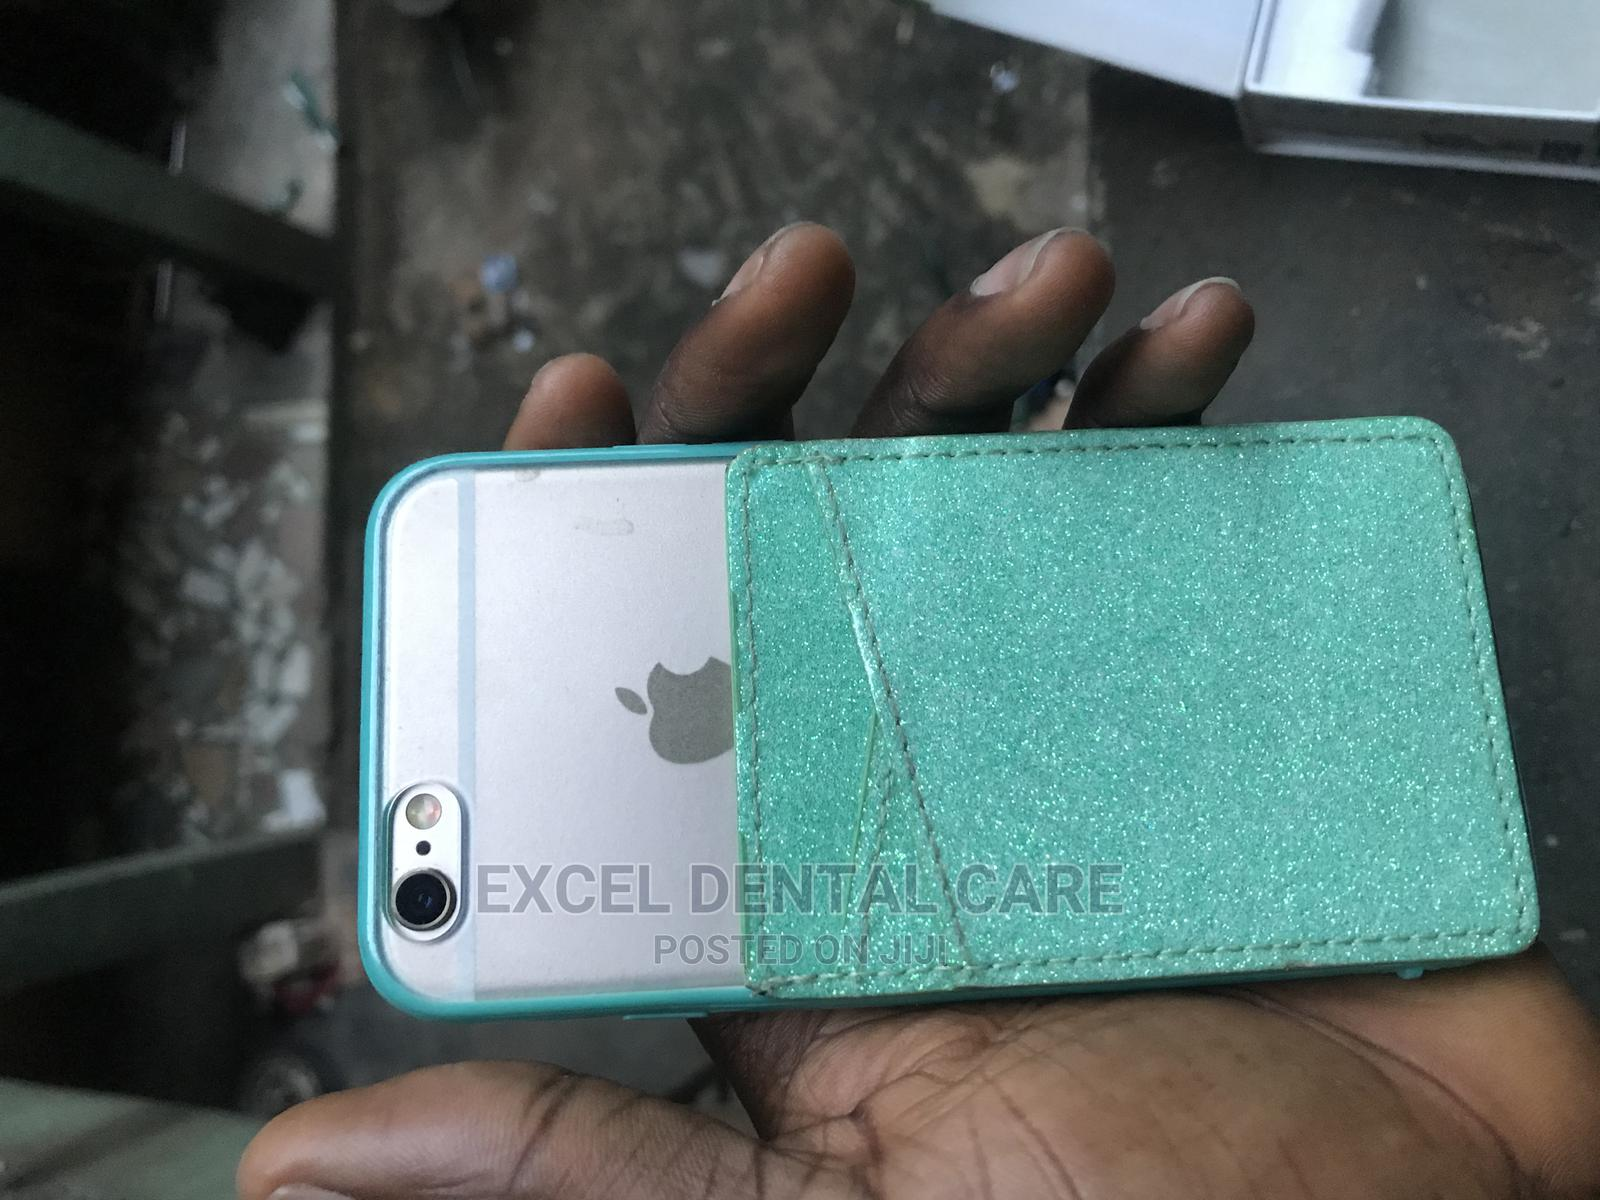 Apple iPhone 7 32 GB Gray   Mobile Phones for sale in Benin City, Edo State, Nigeria